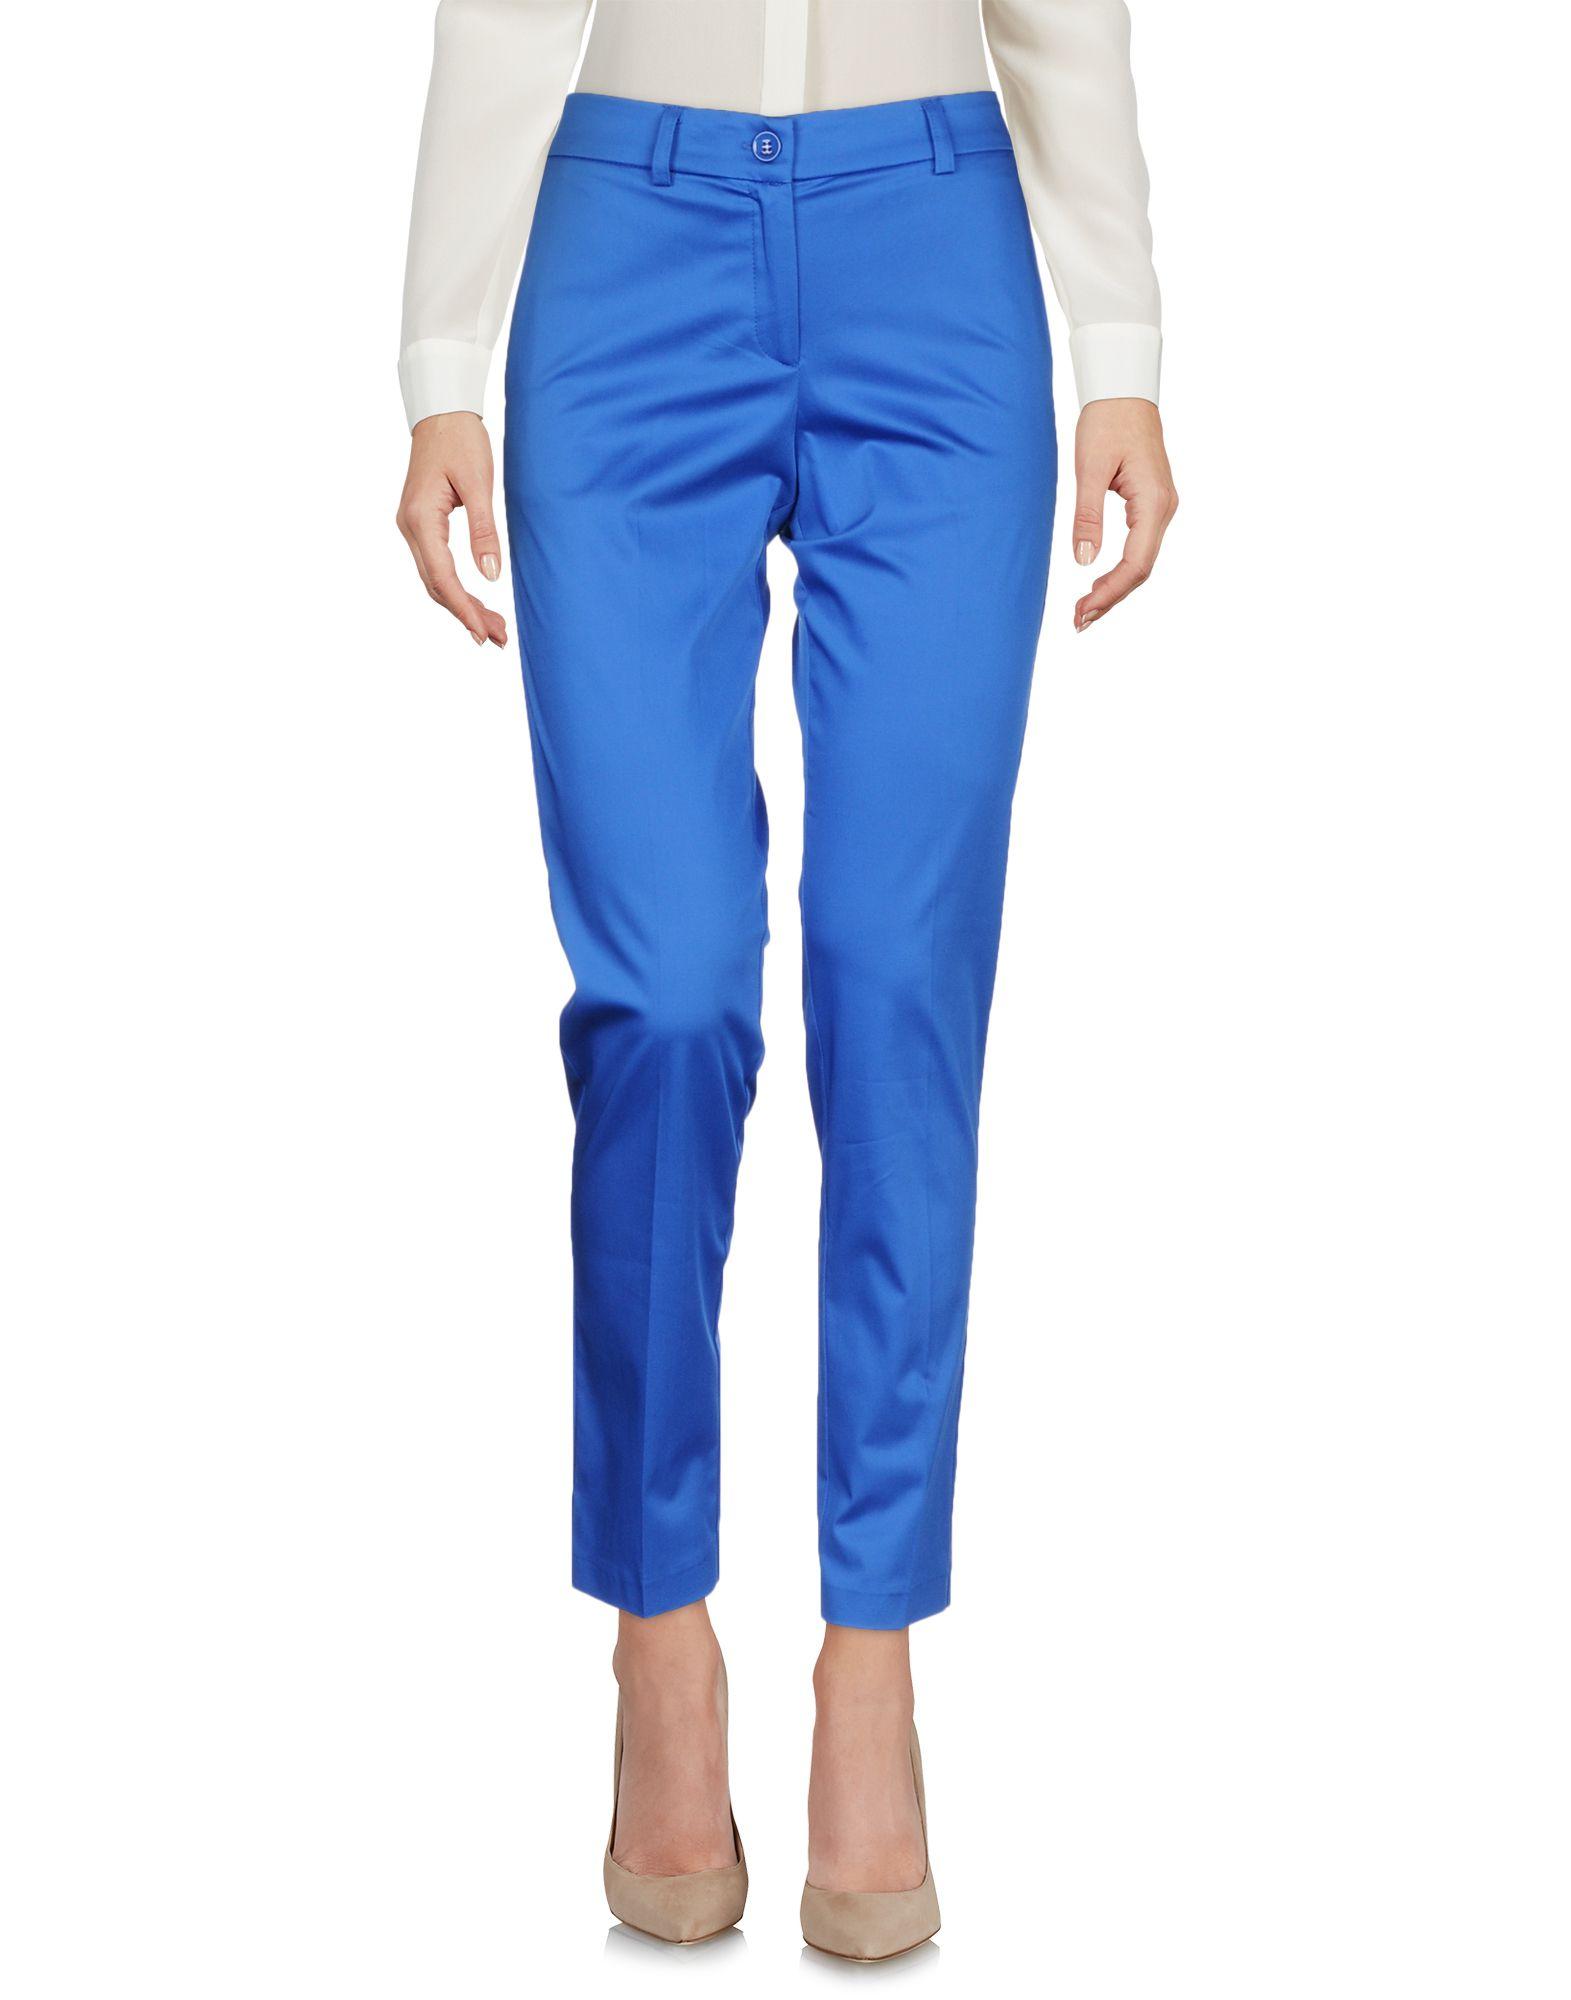 Pantalone Blugirl Blumarine Donna - Acquista online su I5Qn8XNI7